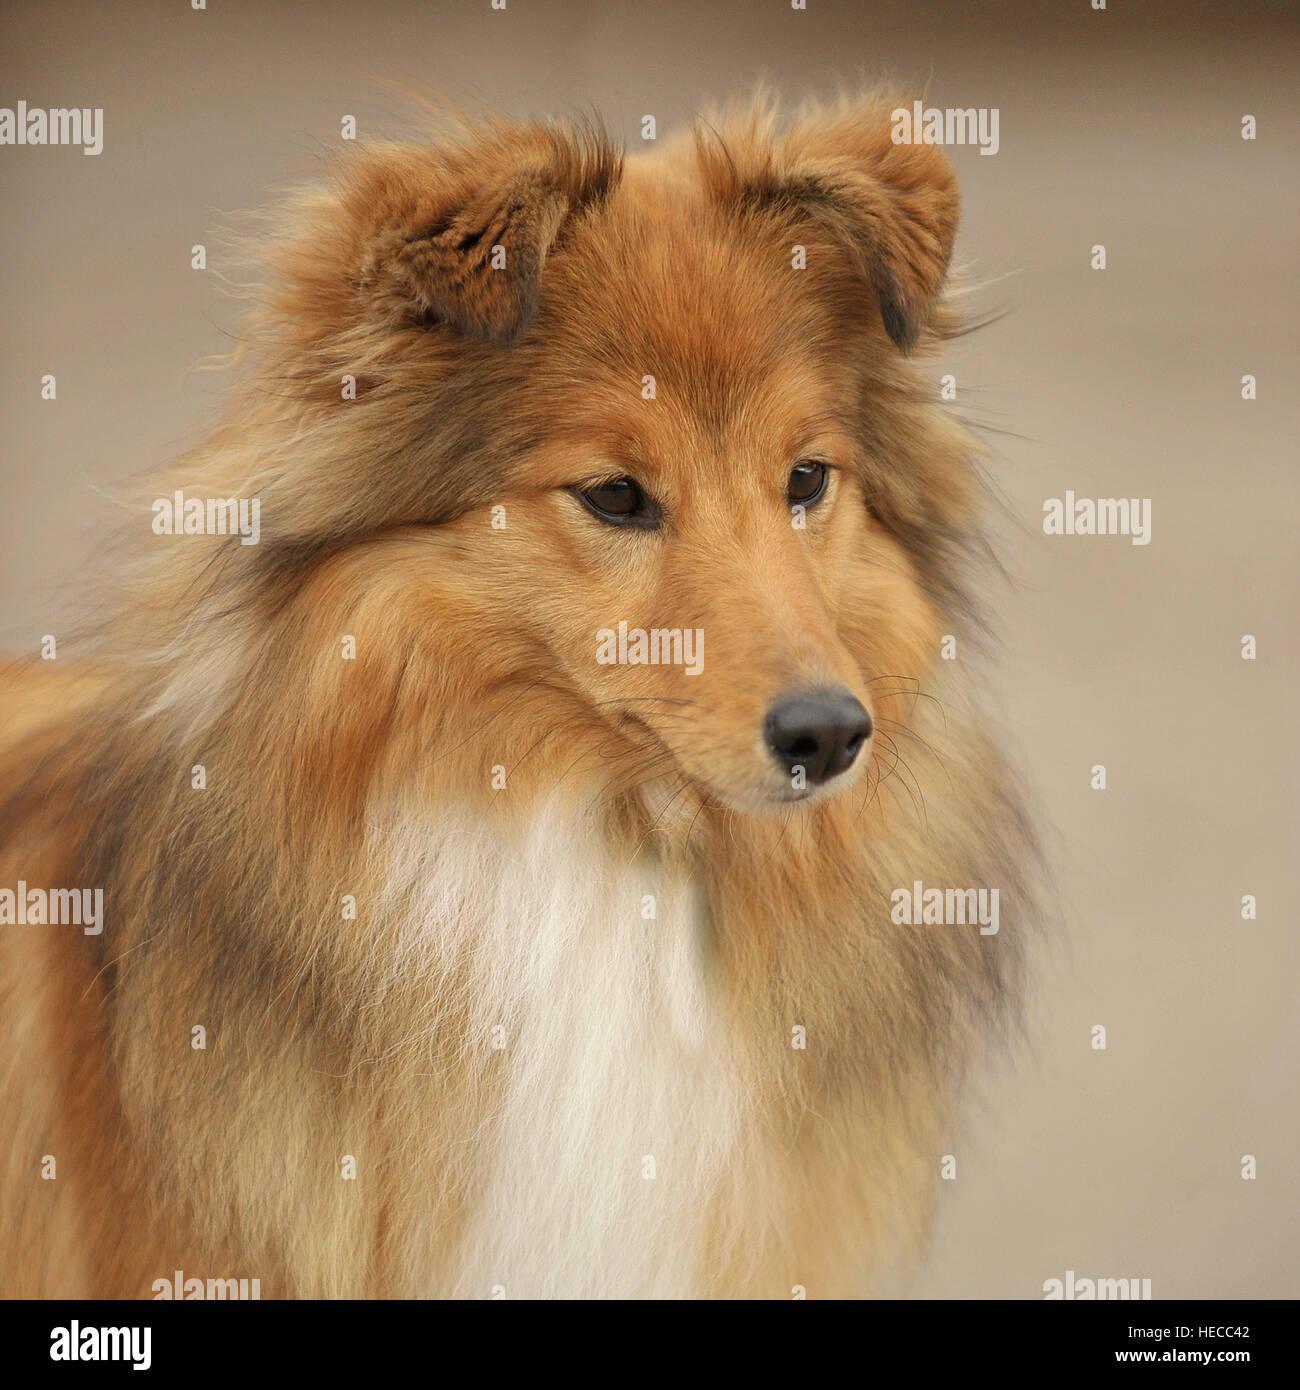 Shetland Sheepdog Banque D'Images